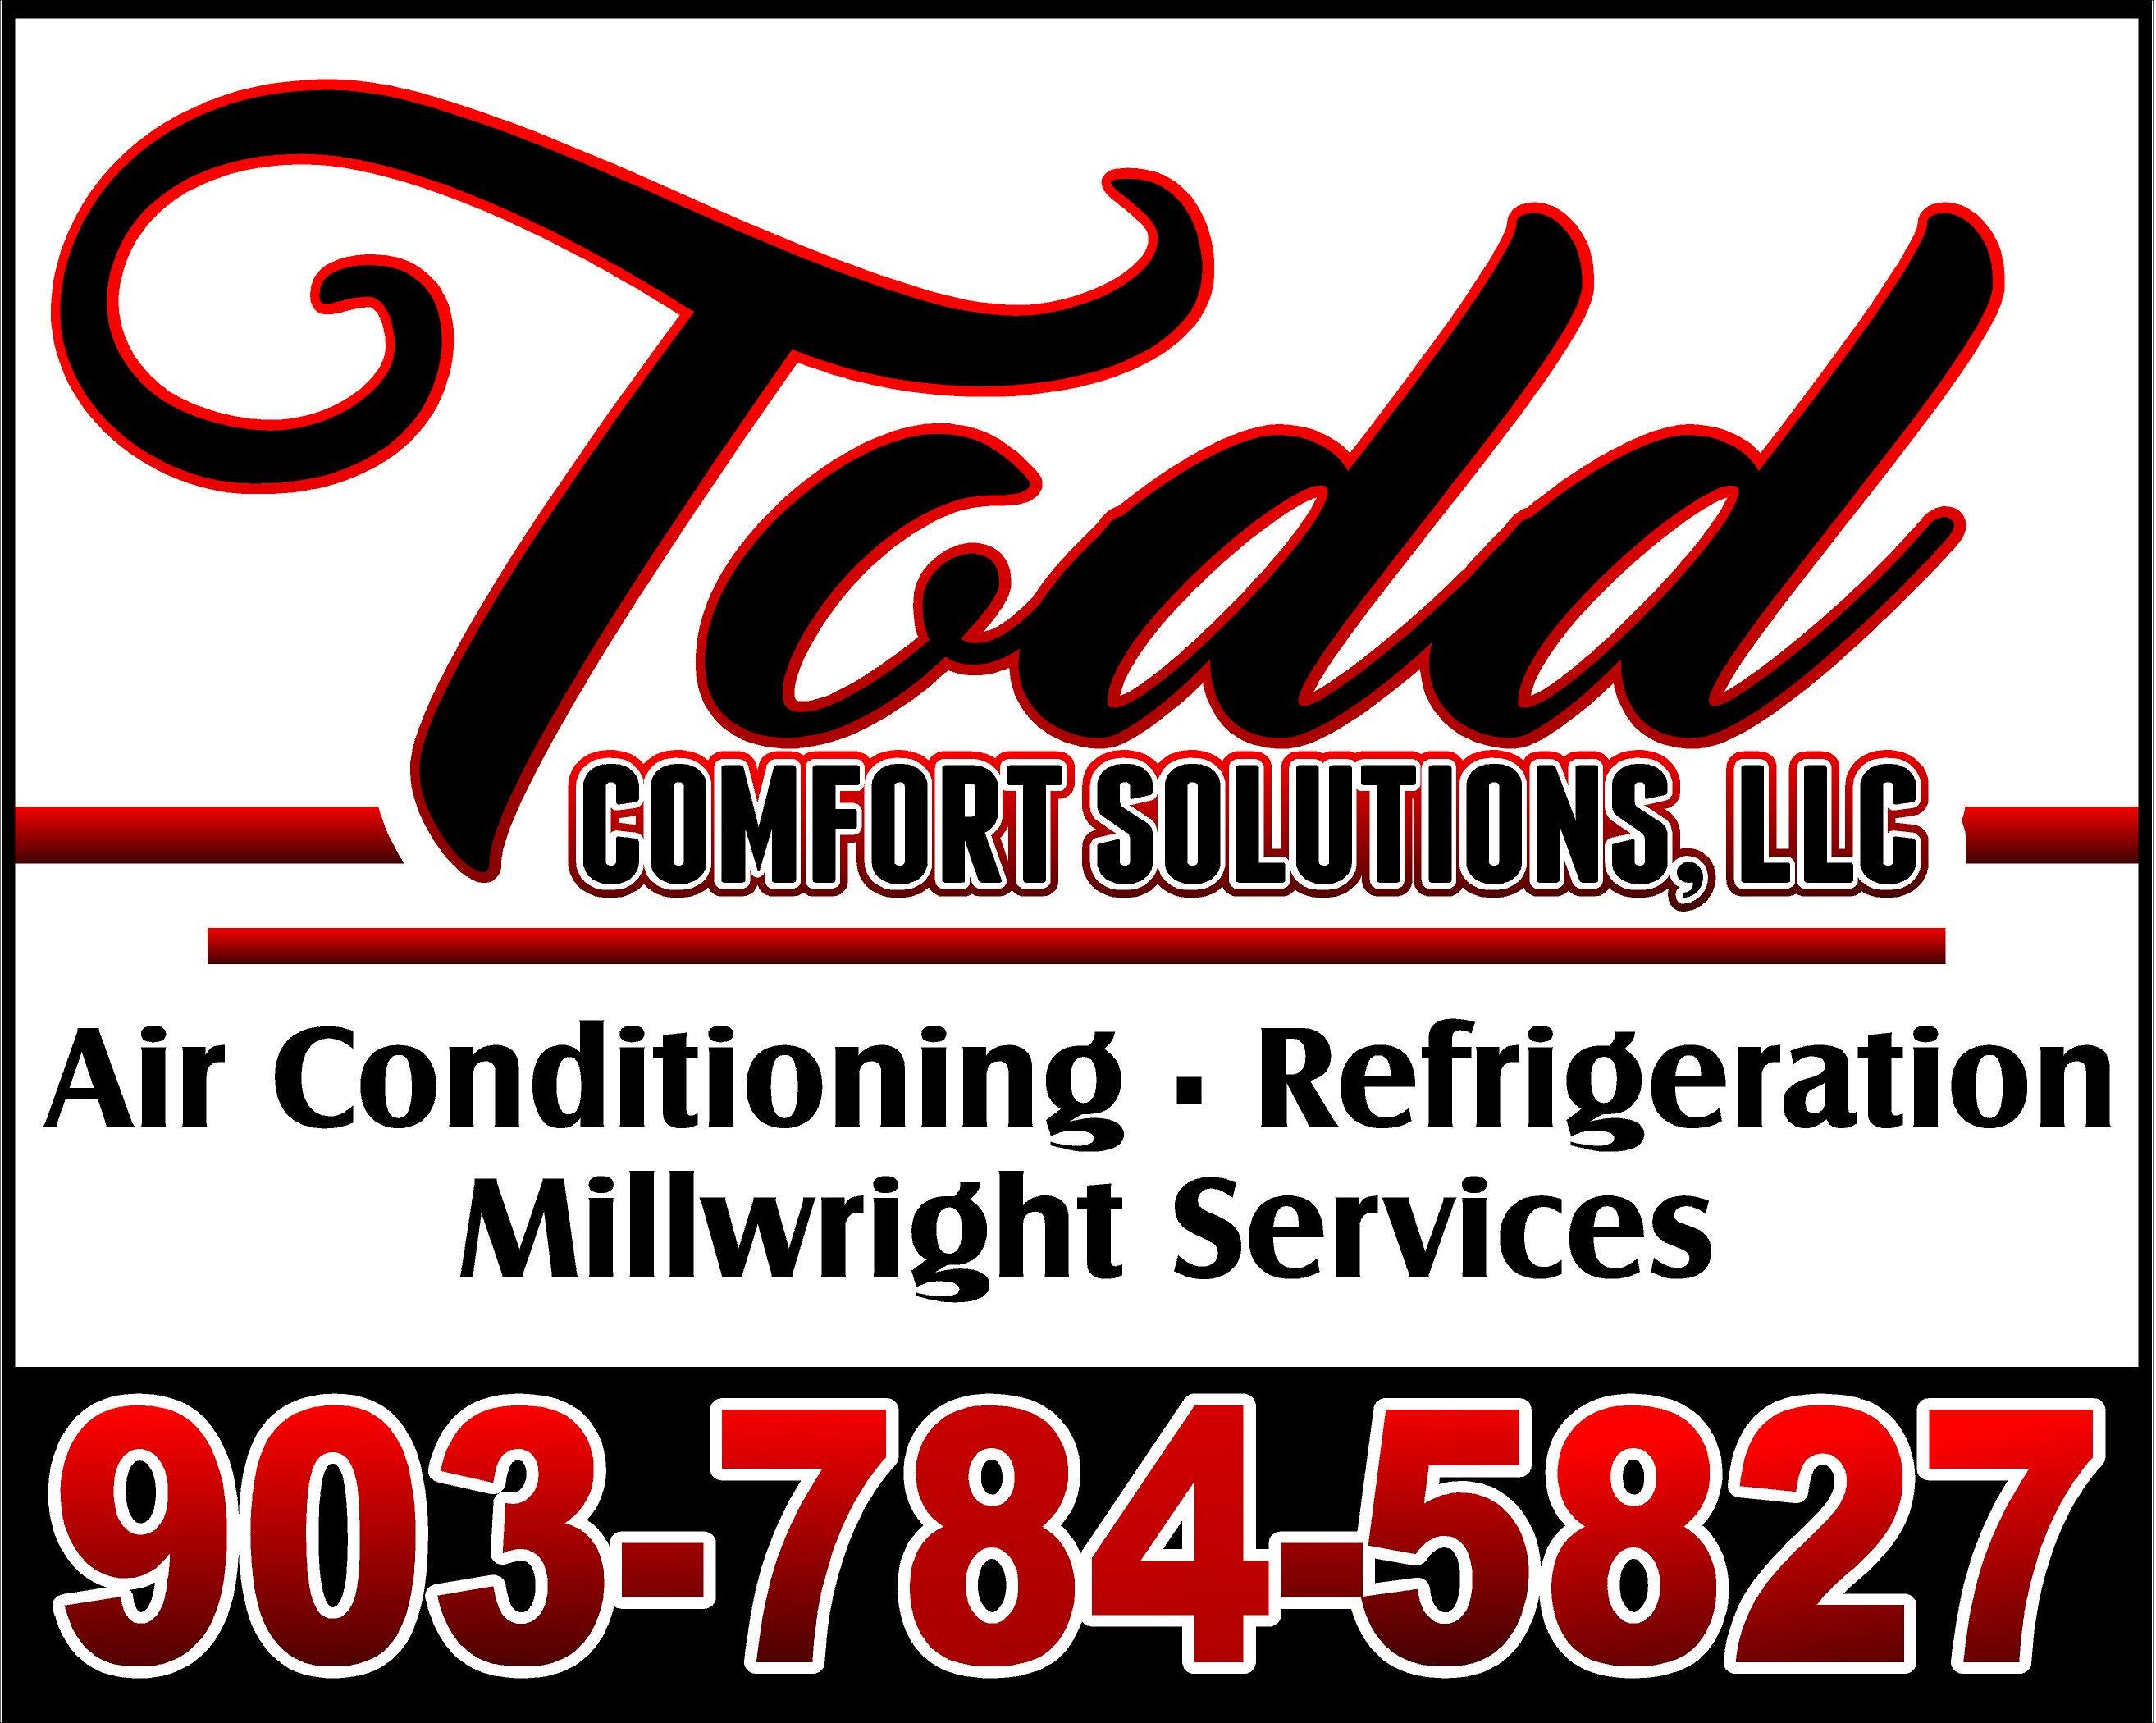 Todd Comfort Solutions, LLC